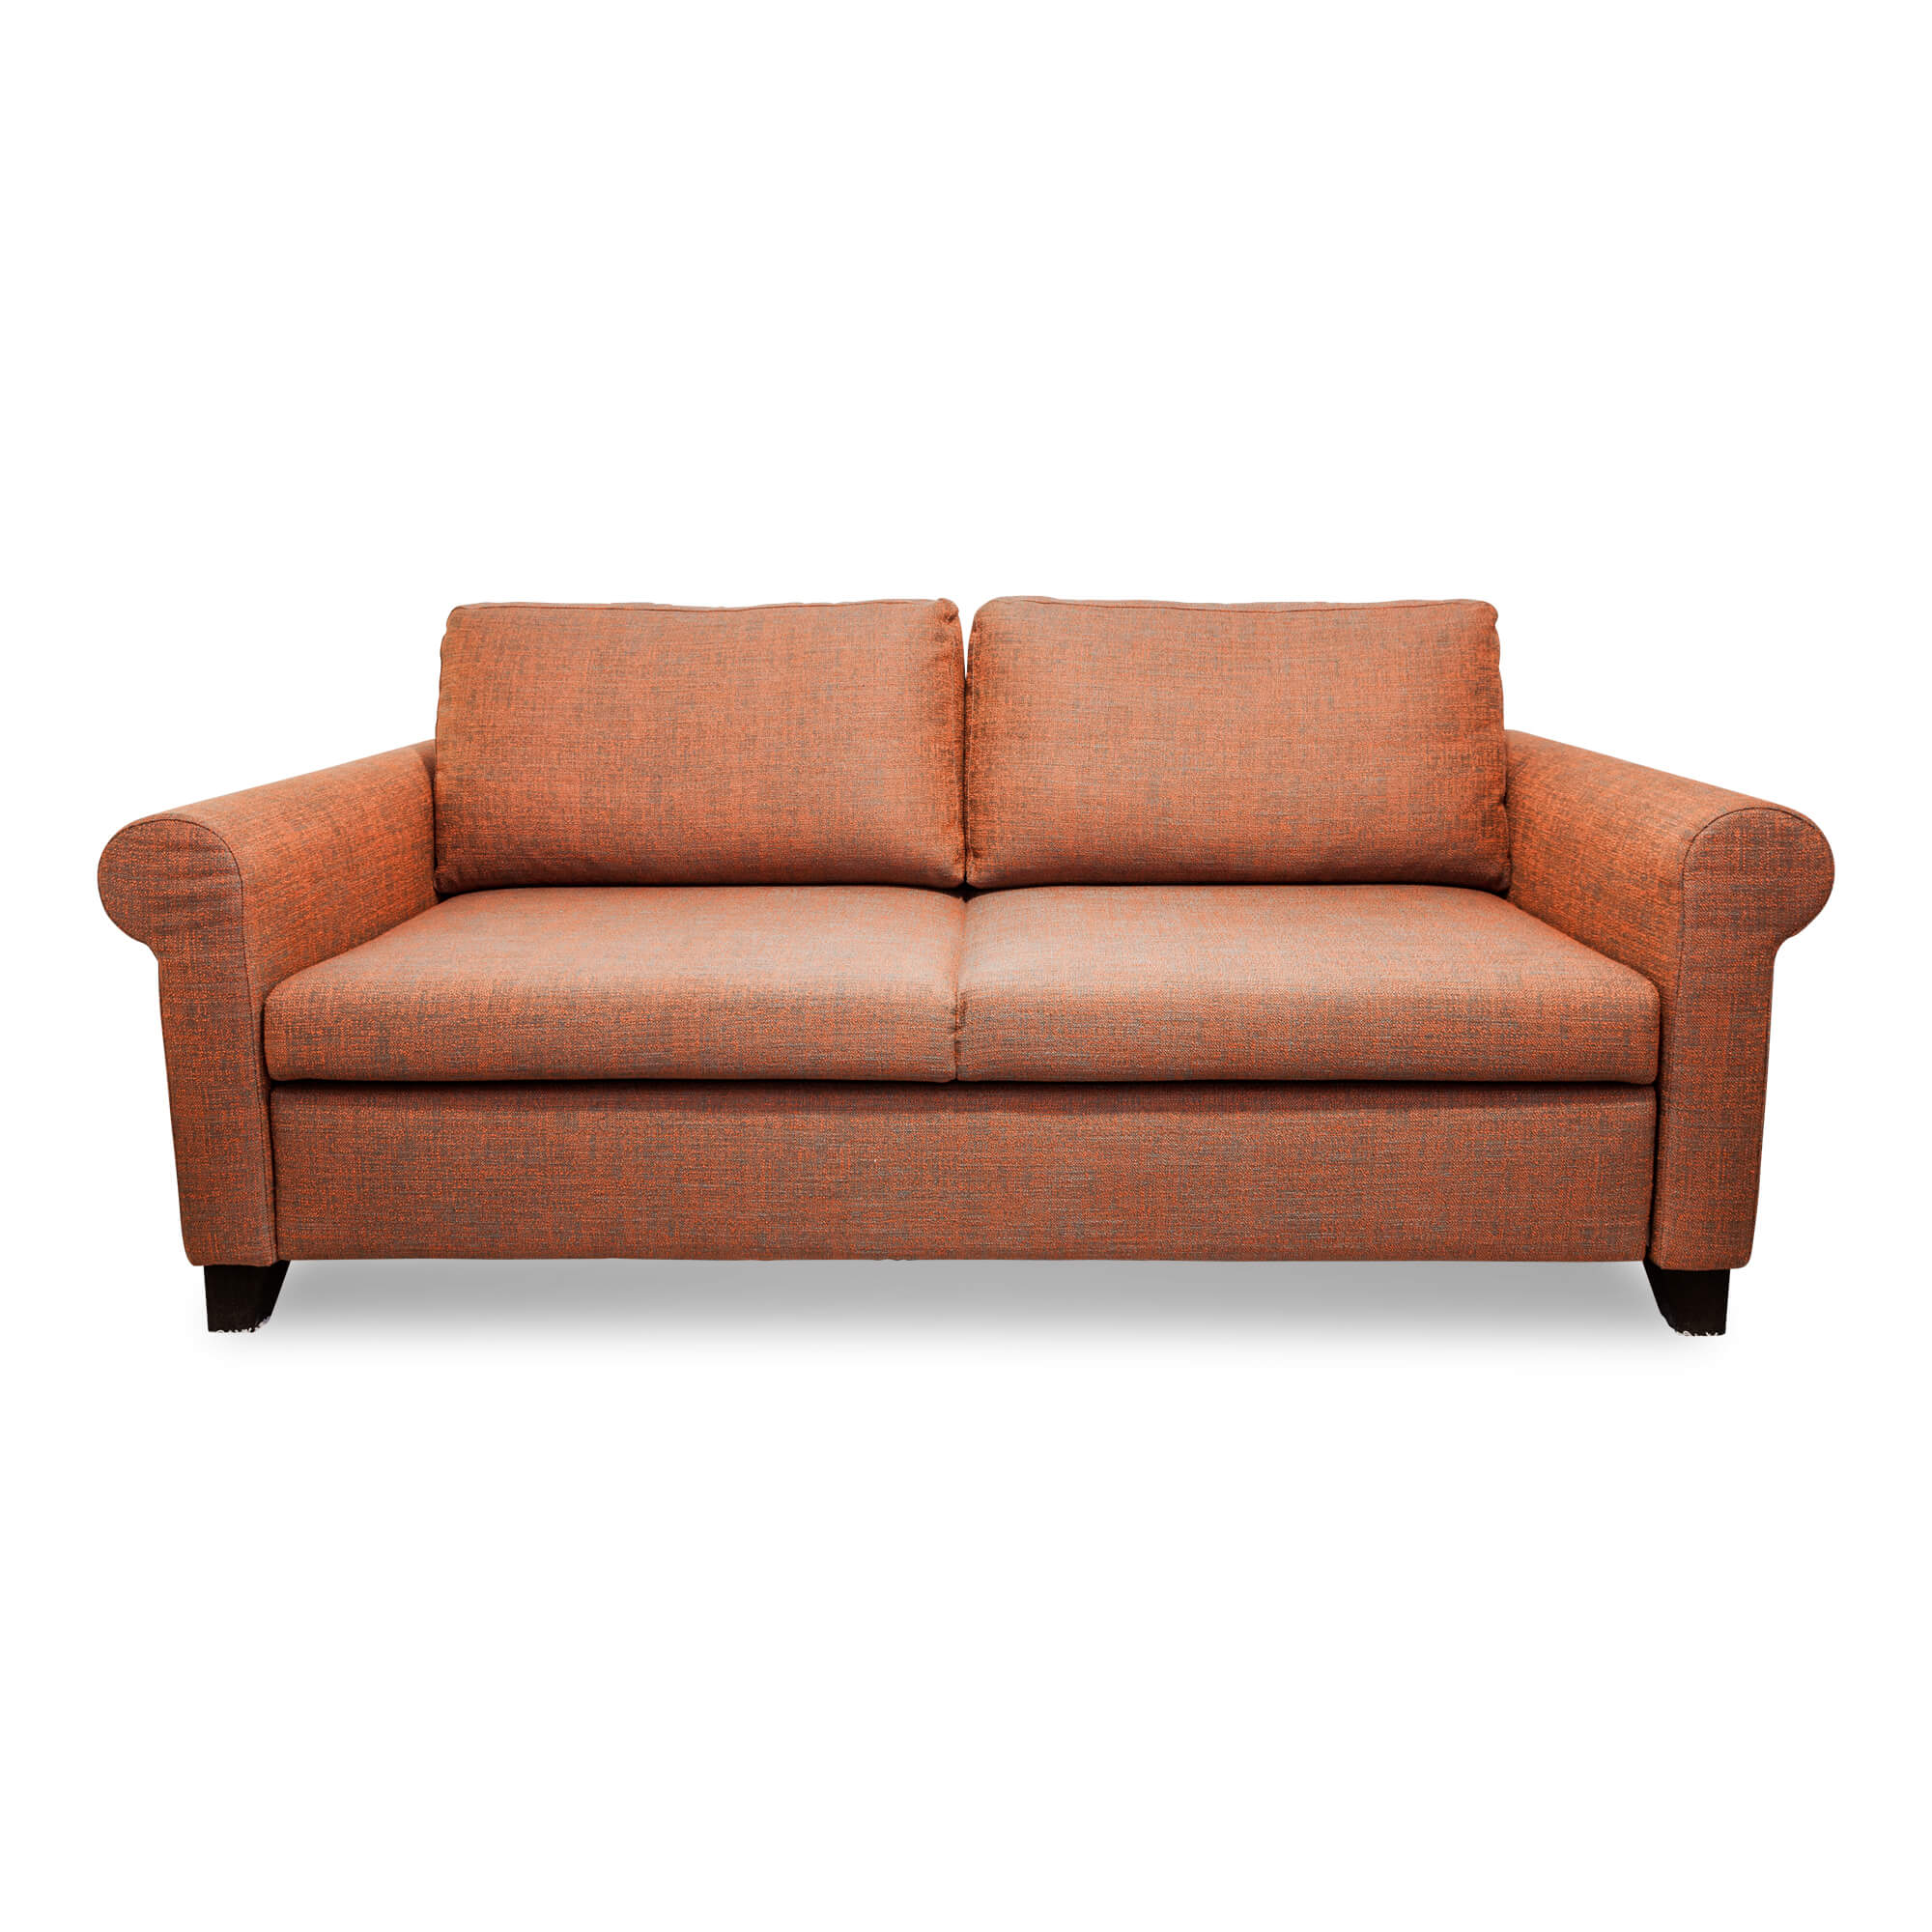 Sofa Duna 160 Stoff Orange Schlaffunktion | Signet ...